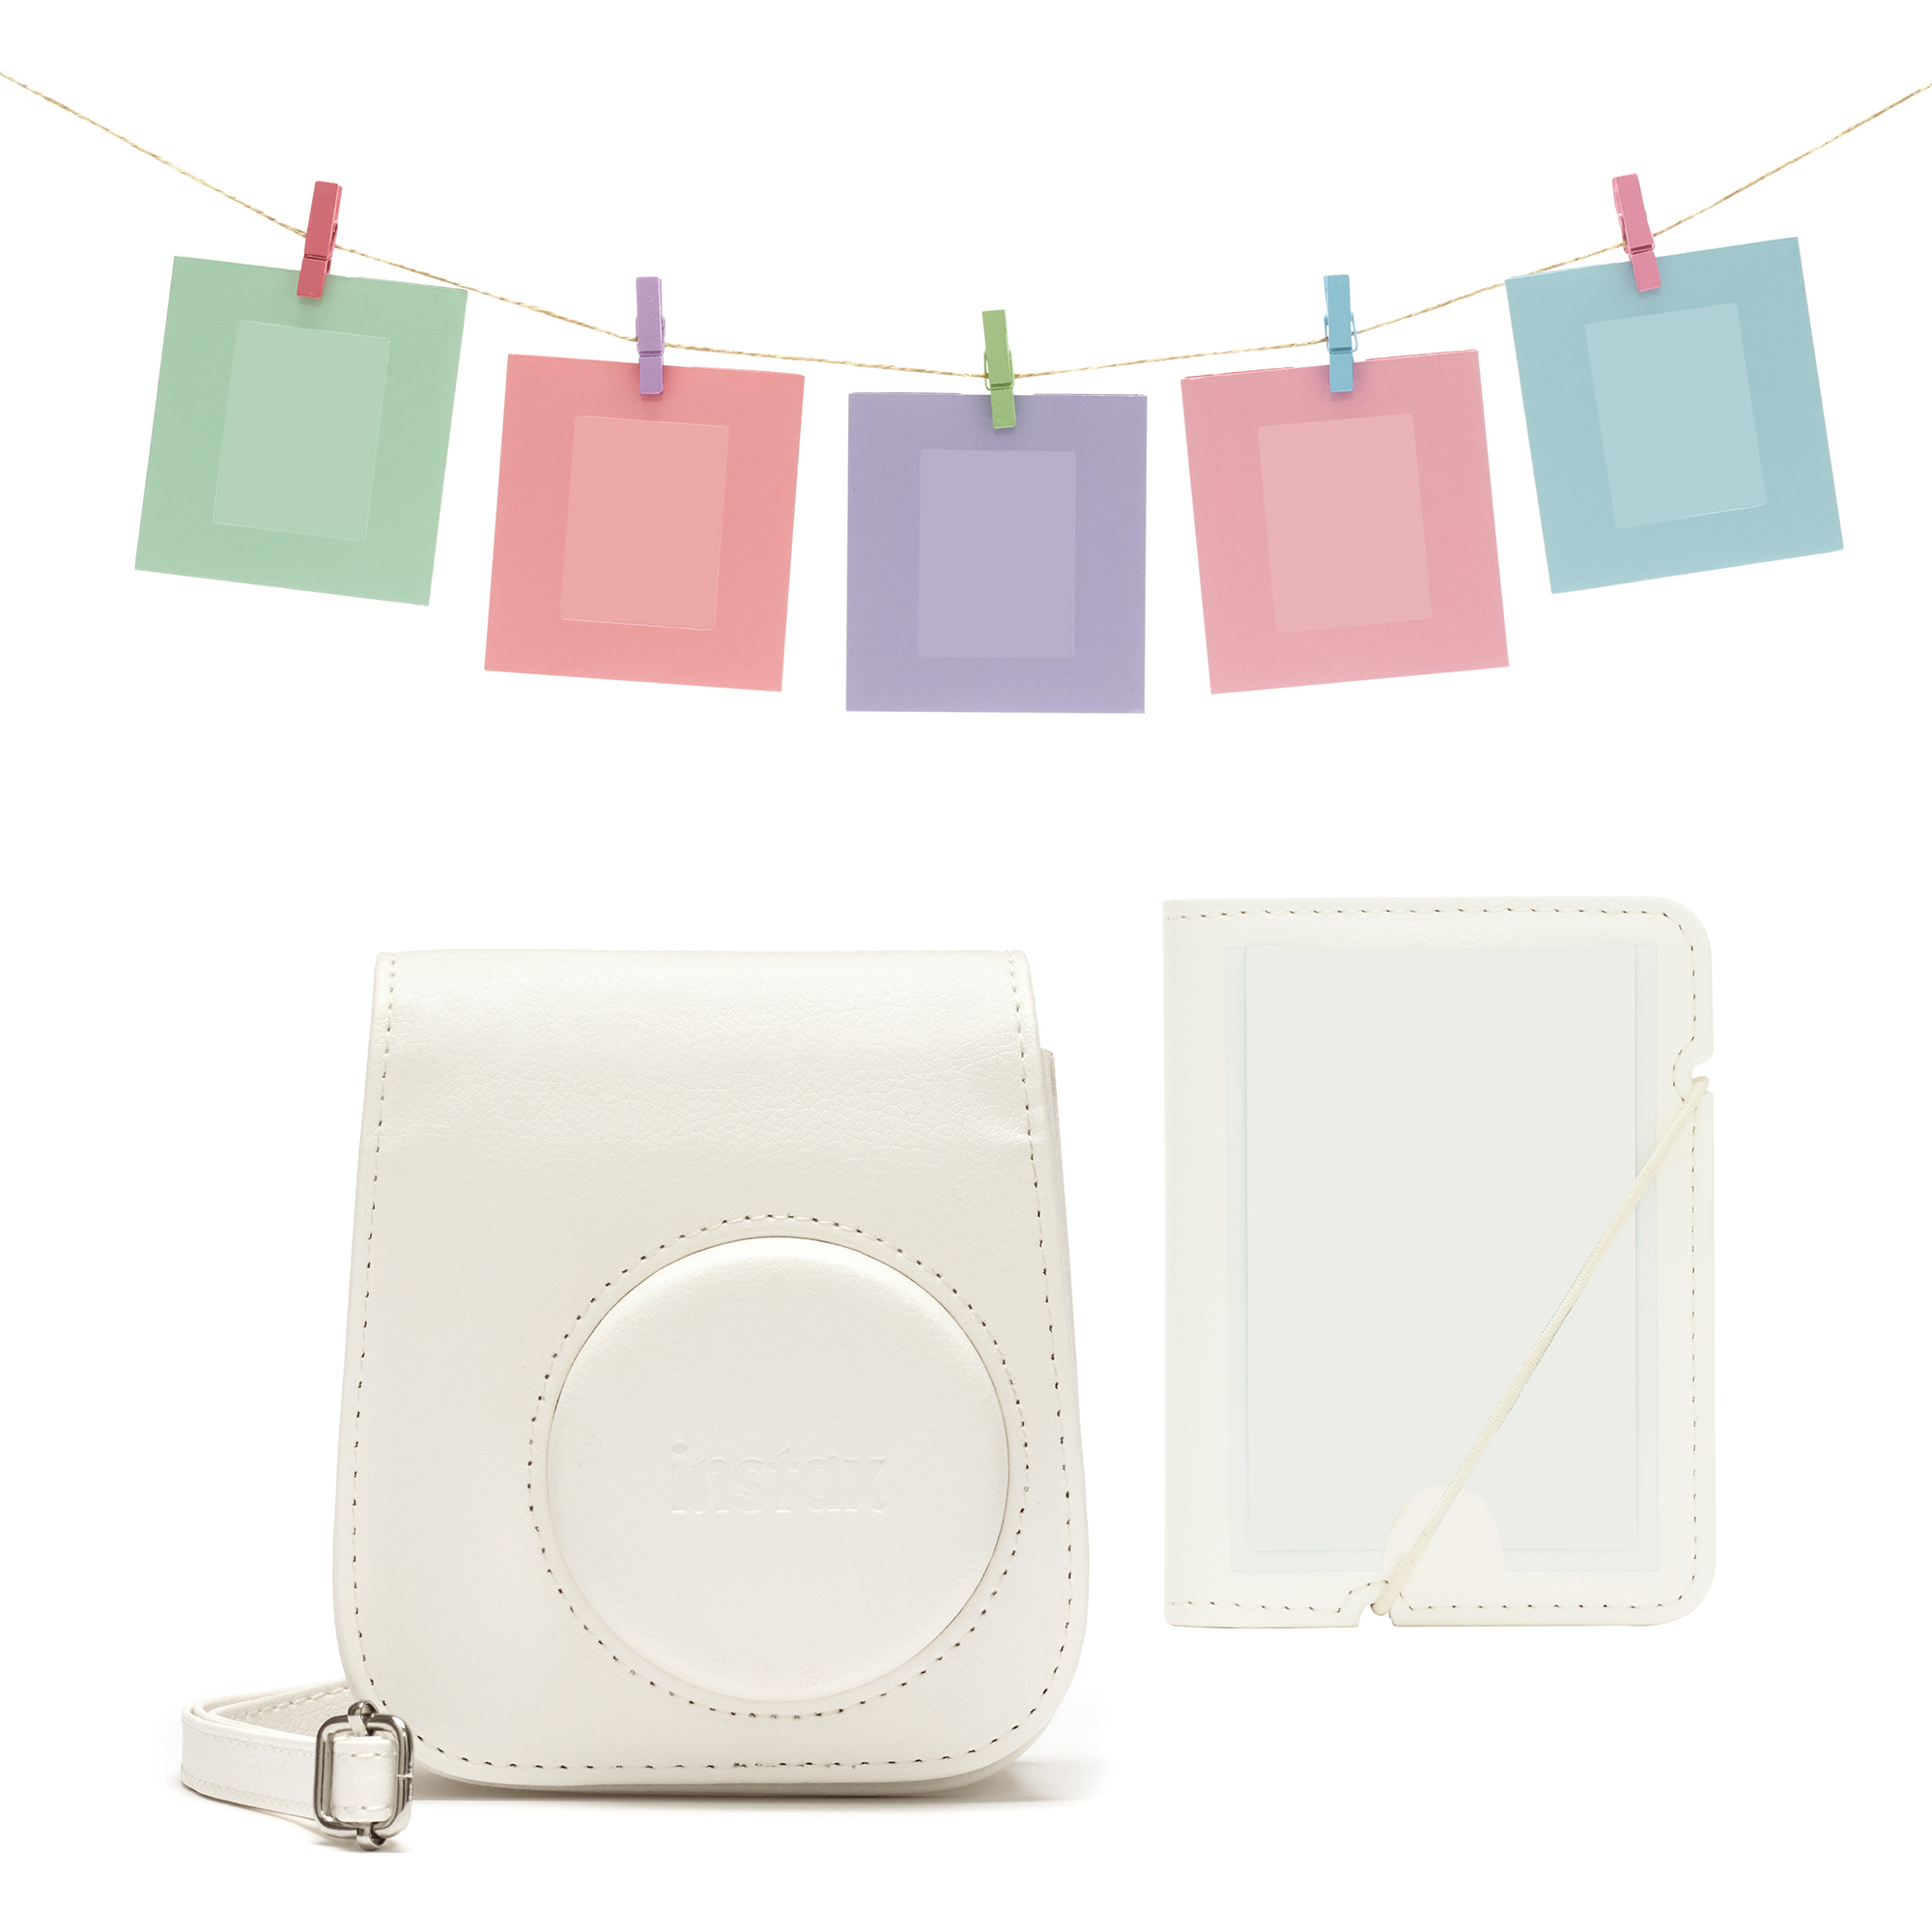 Accessoire kit instax mini 11 - Ice White